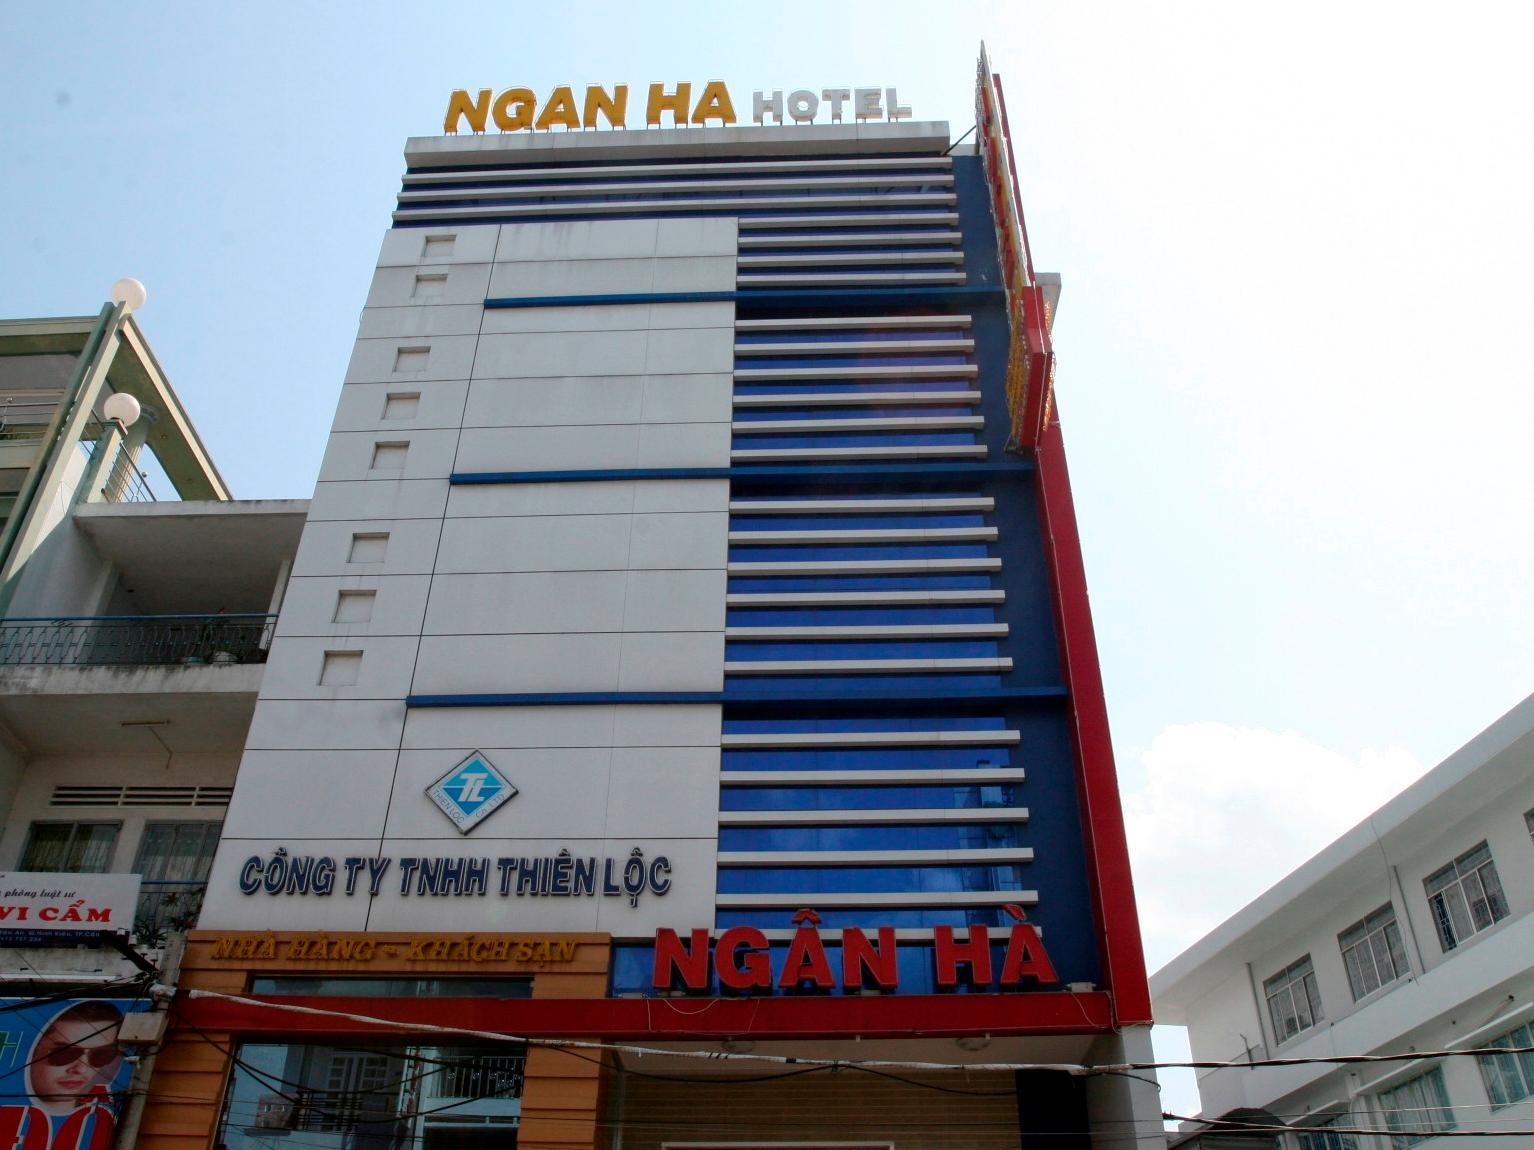 Ngan Ha Hotel - Hotell och Boende i Vietnam , Can Tho